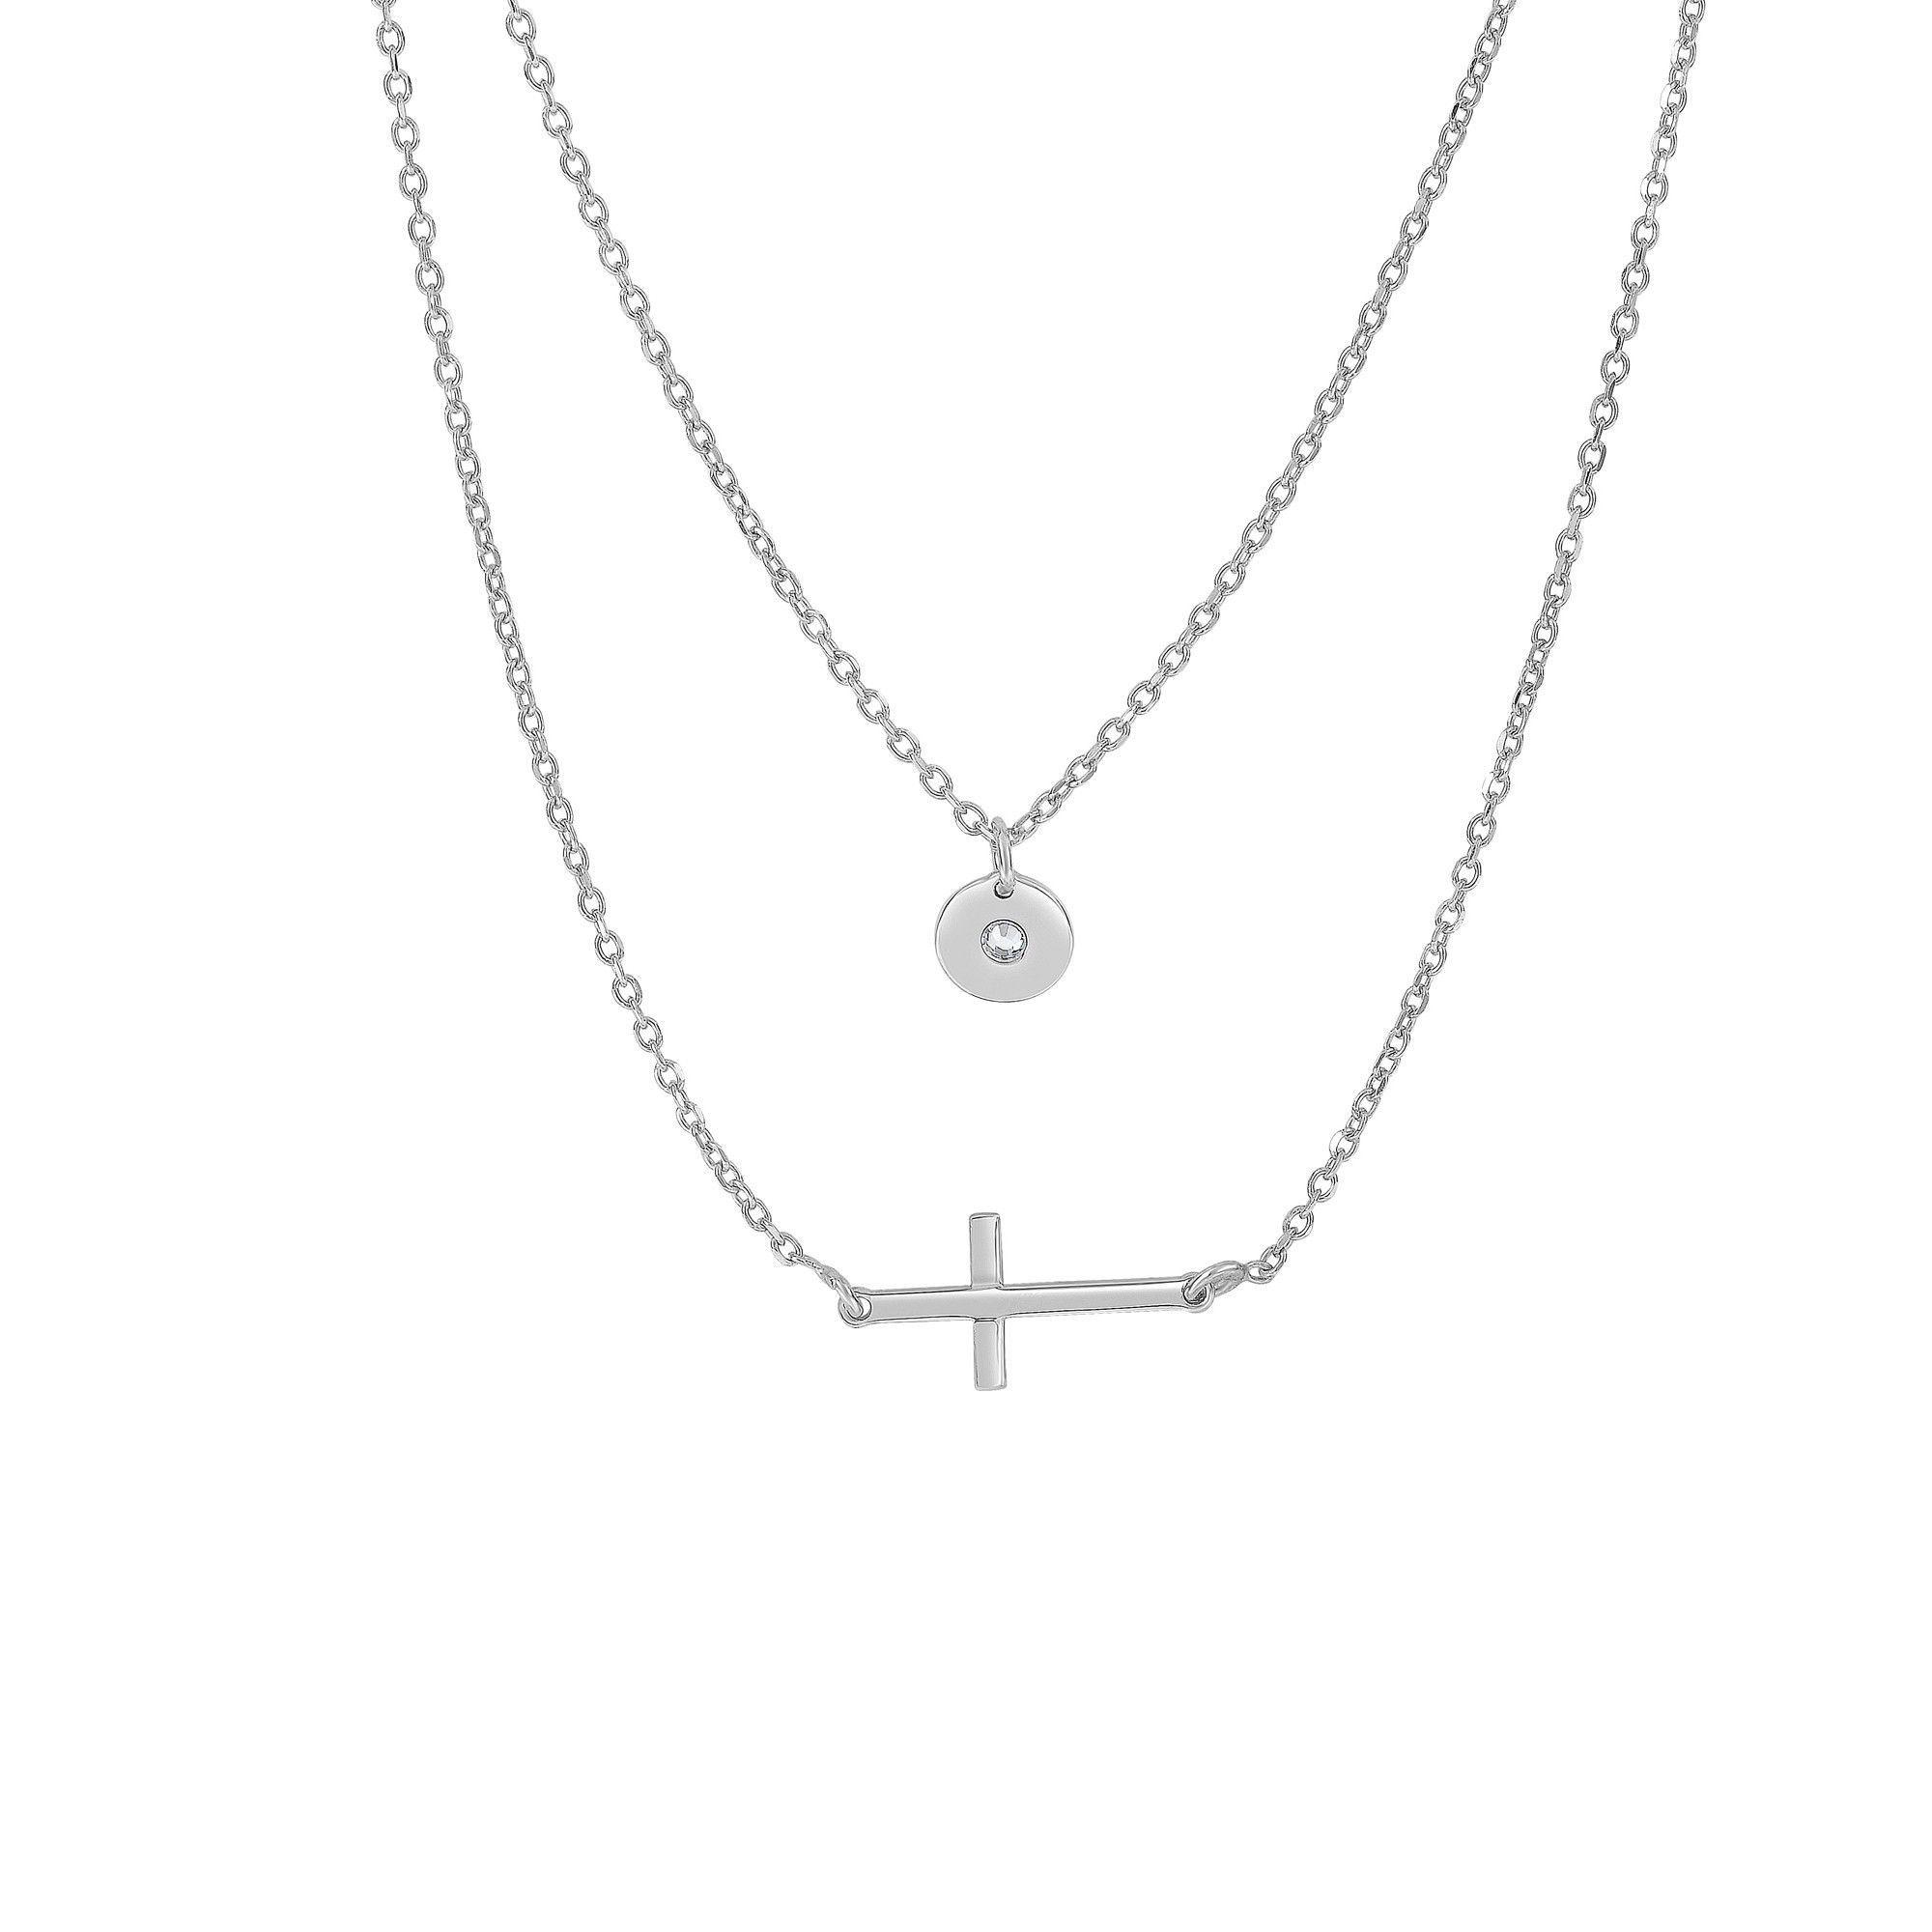 Rhodium Hanging Round Disc Sideways Cross Double Strand Graduated Necklace